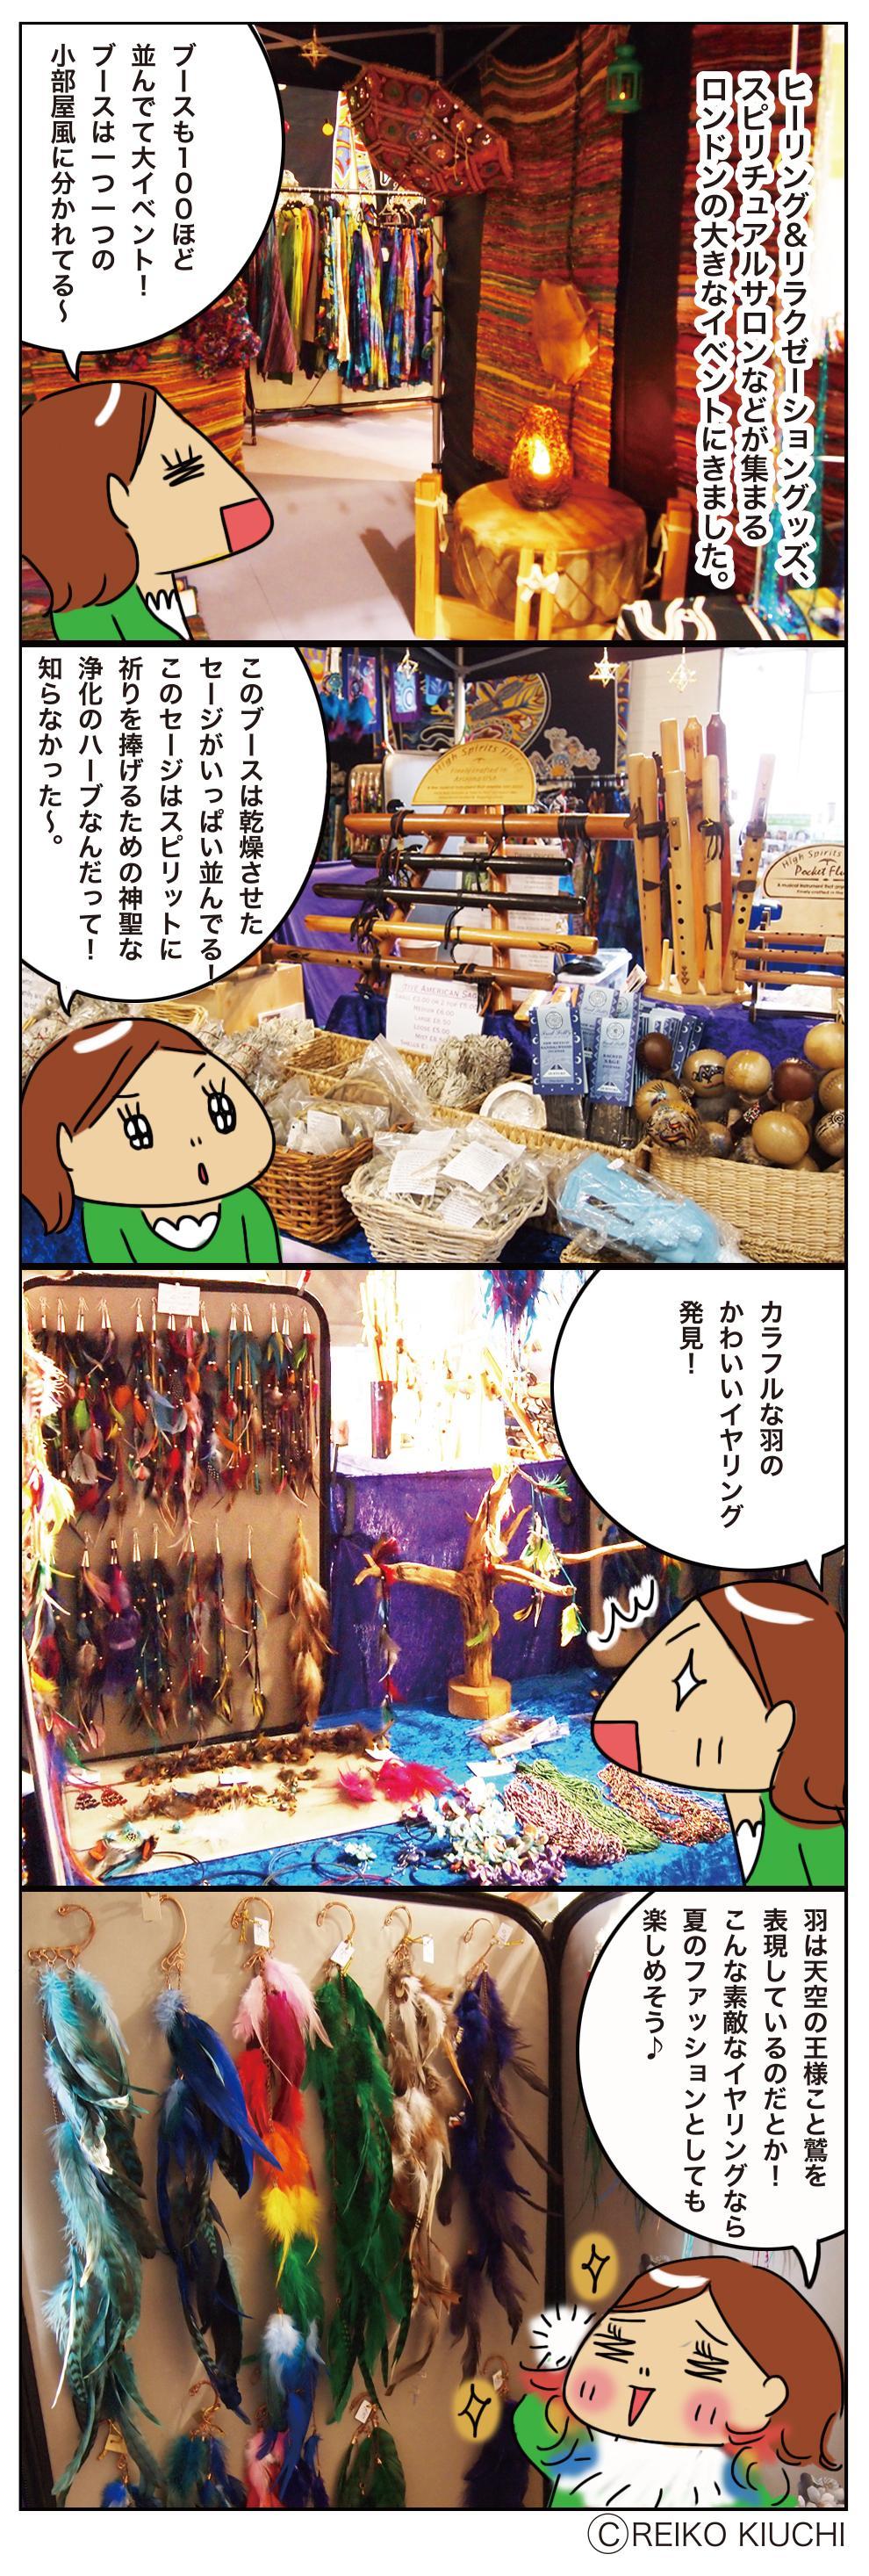 Spiritual漫画201405締切